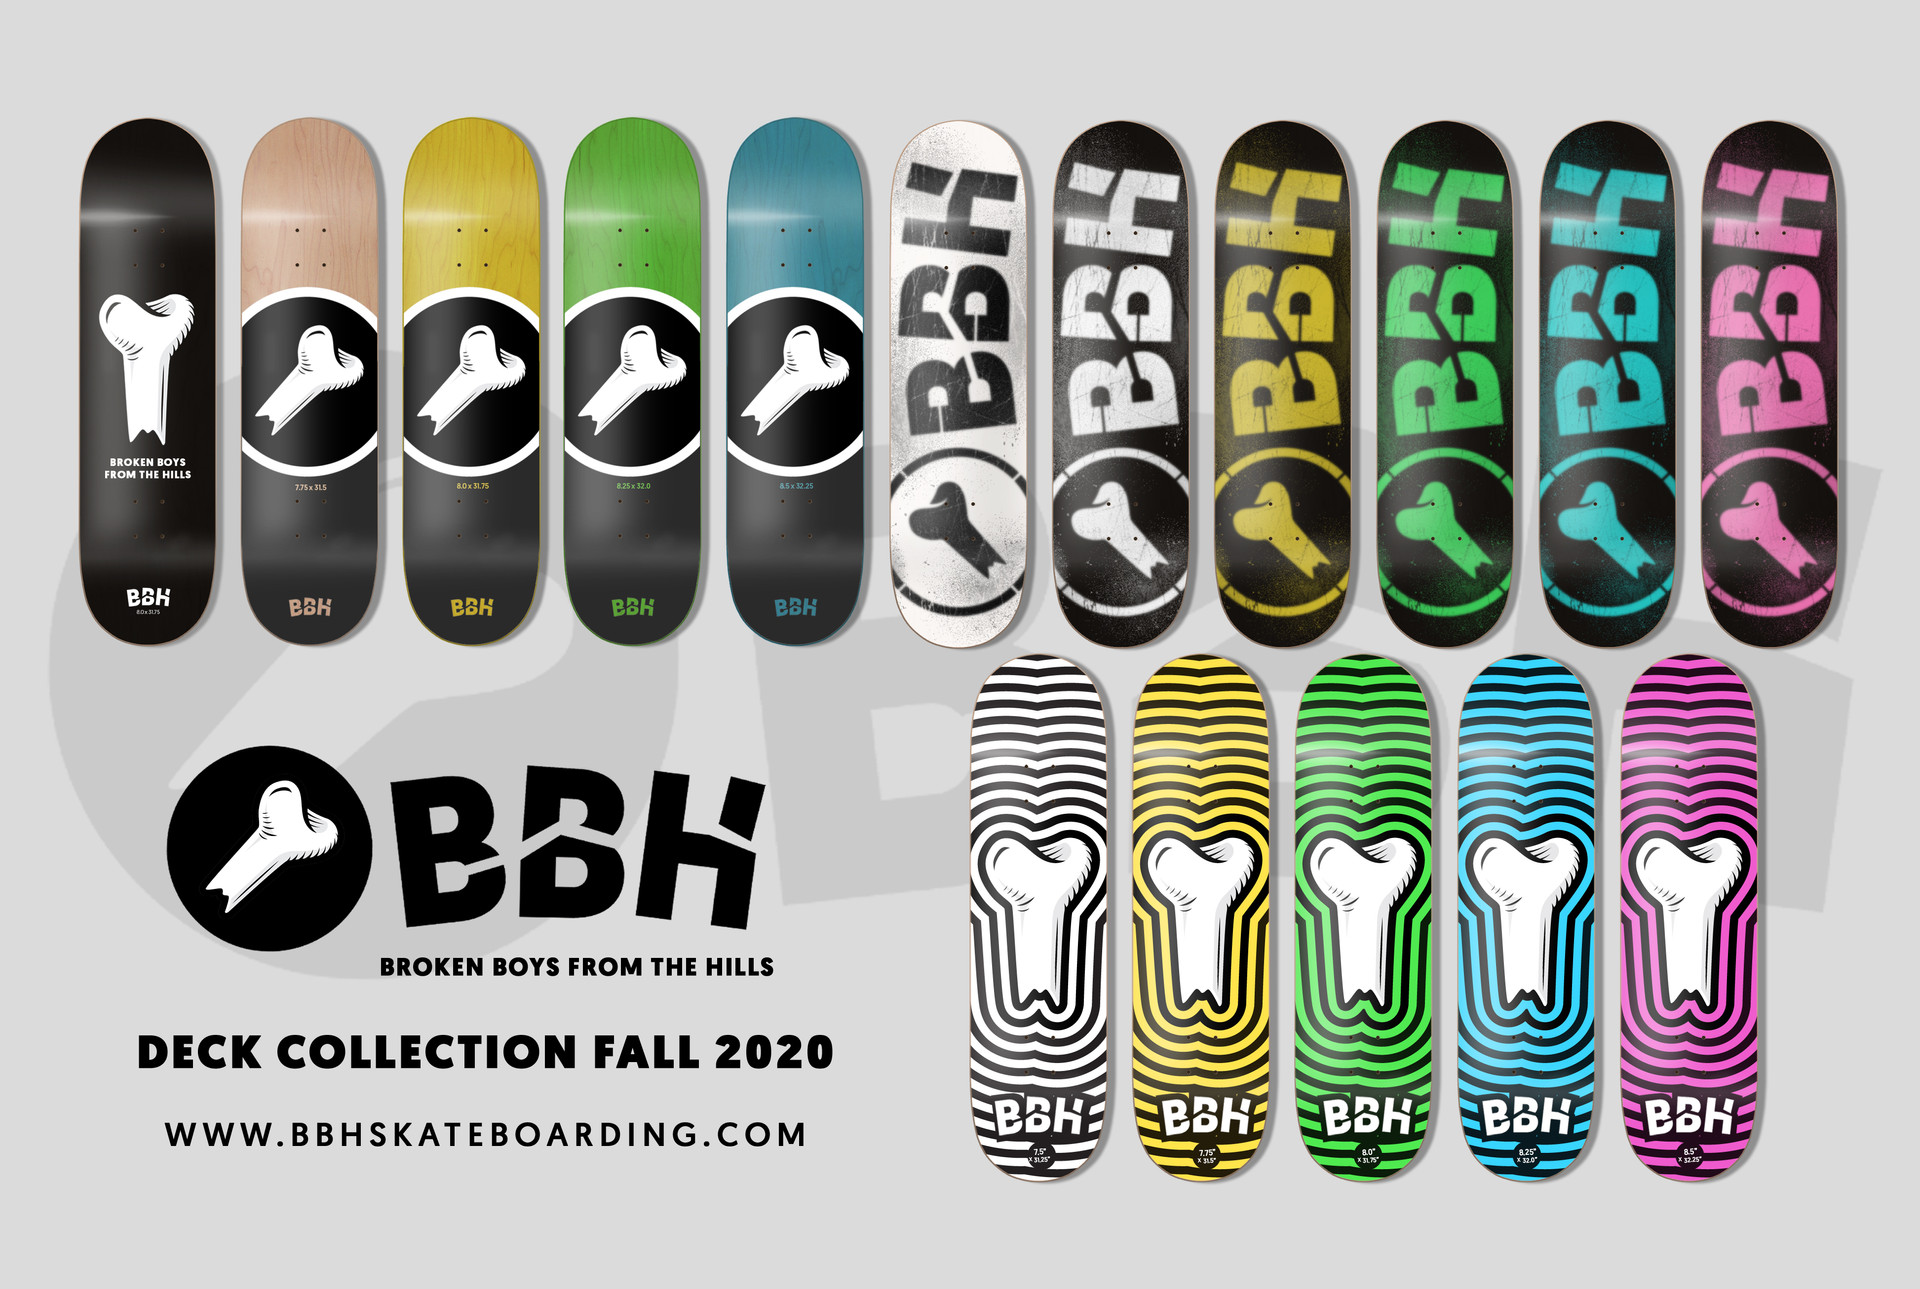 BBH Deck Collection Mockup - MP Grafica